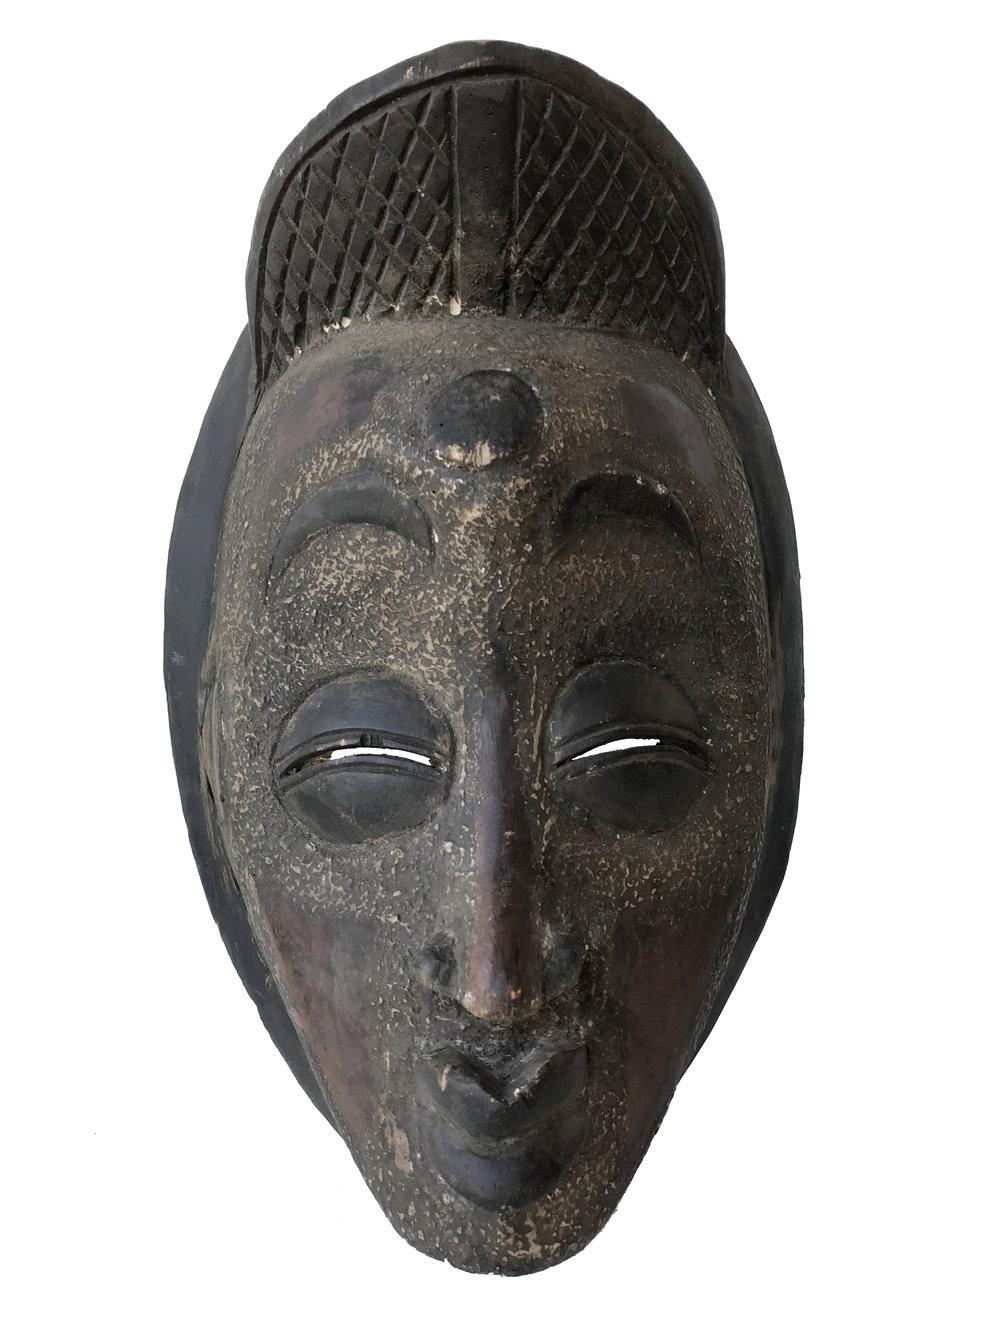 Baole Mask